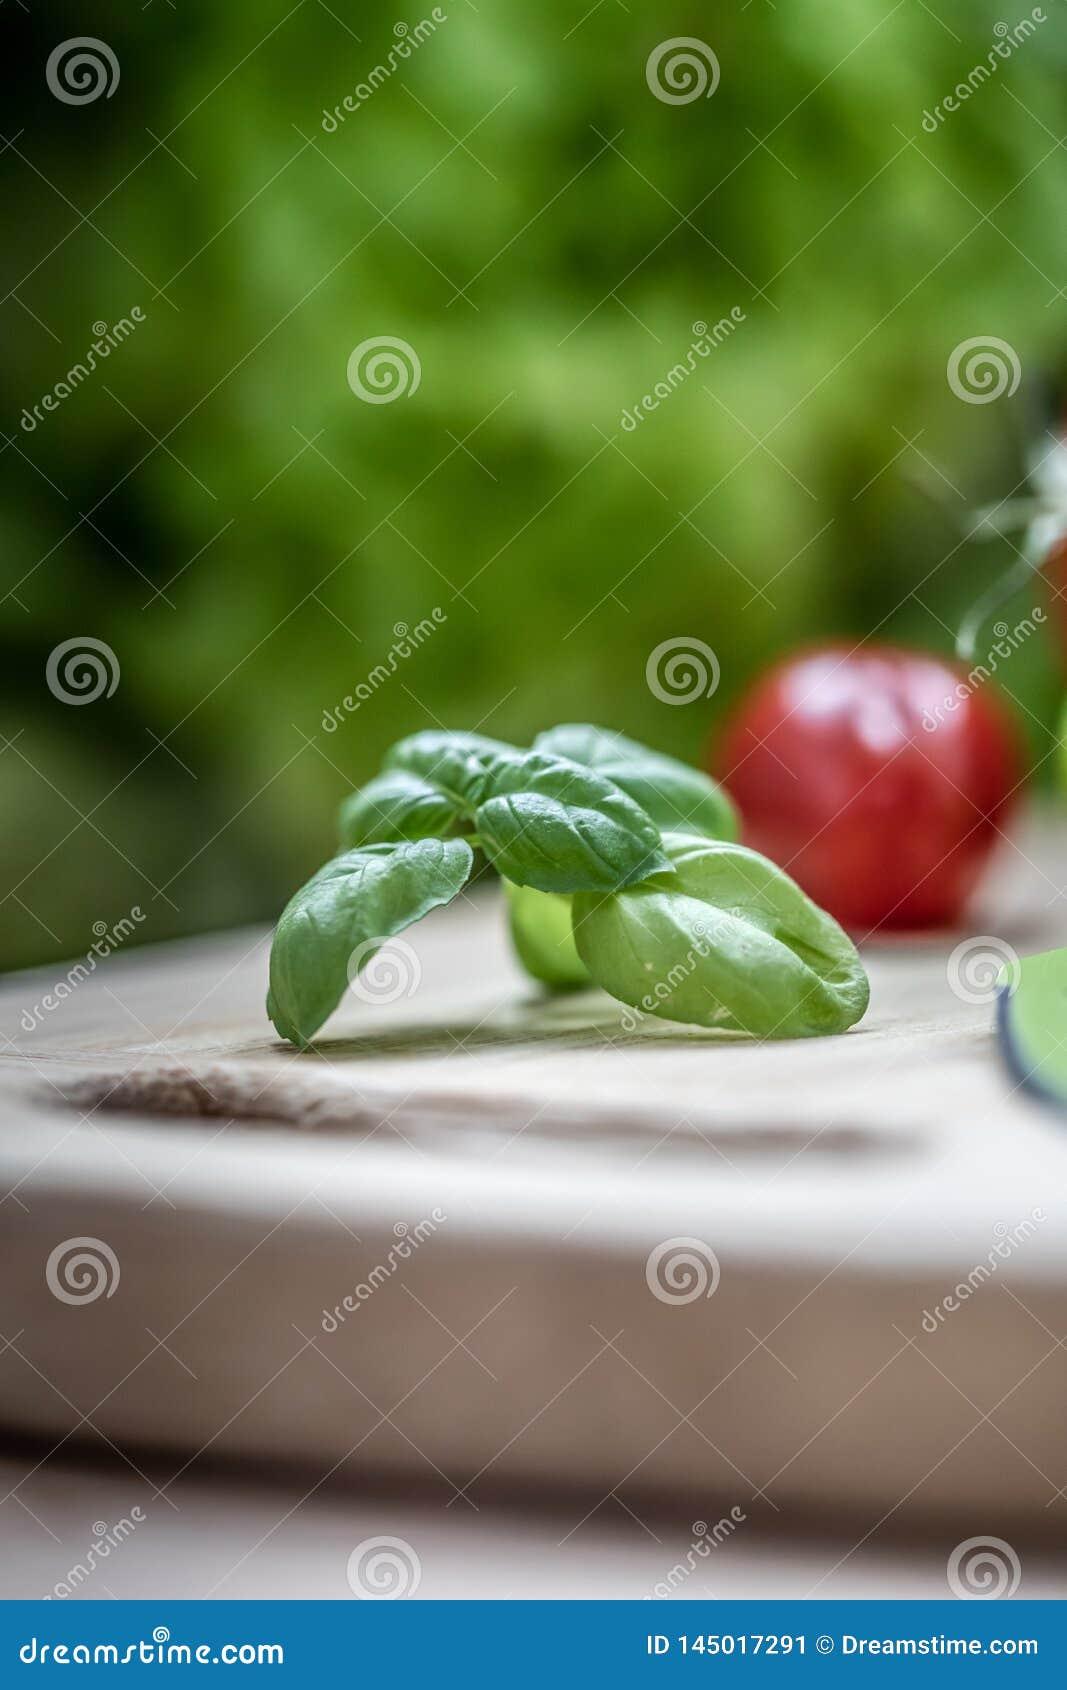 Fresh green basil herb and tomato